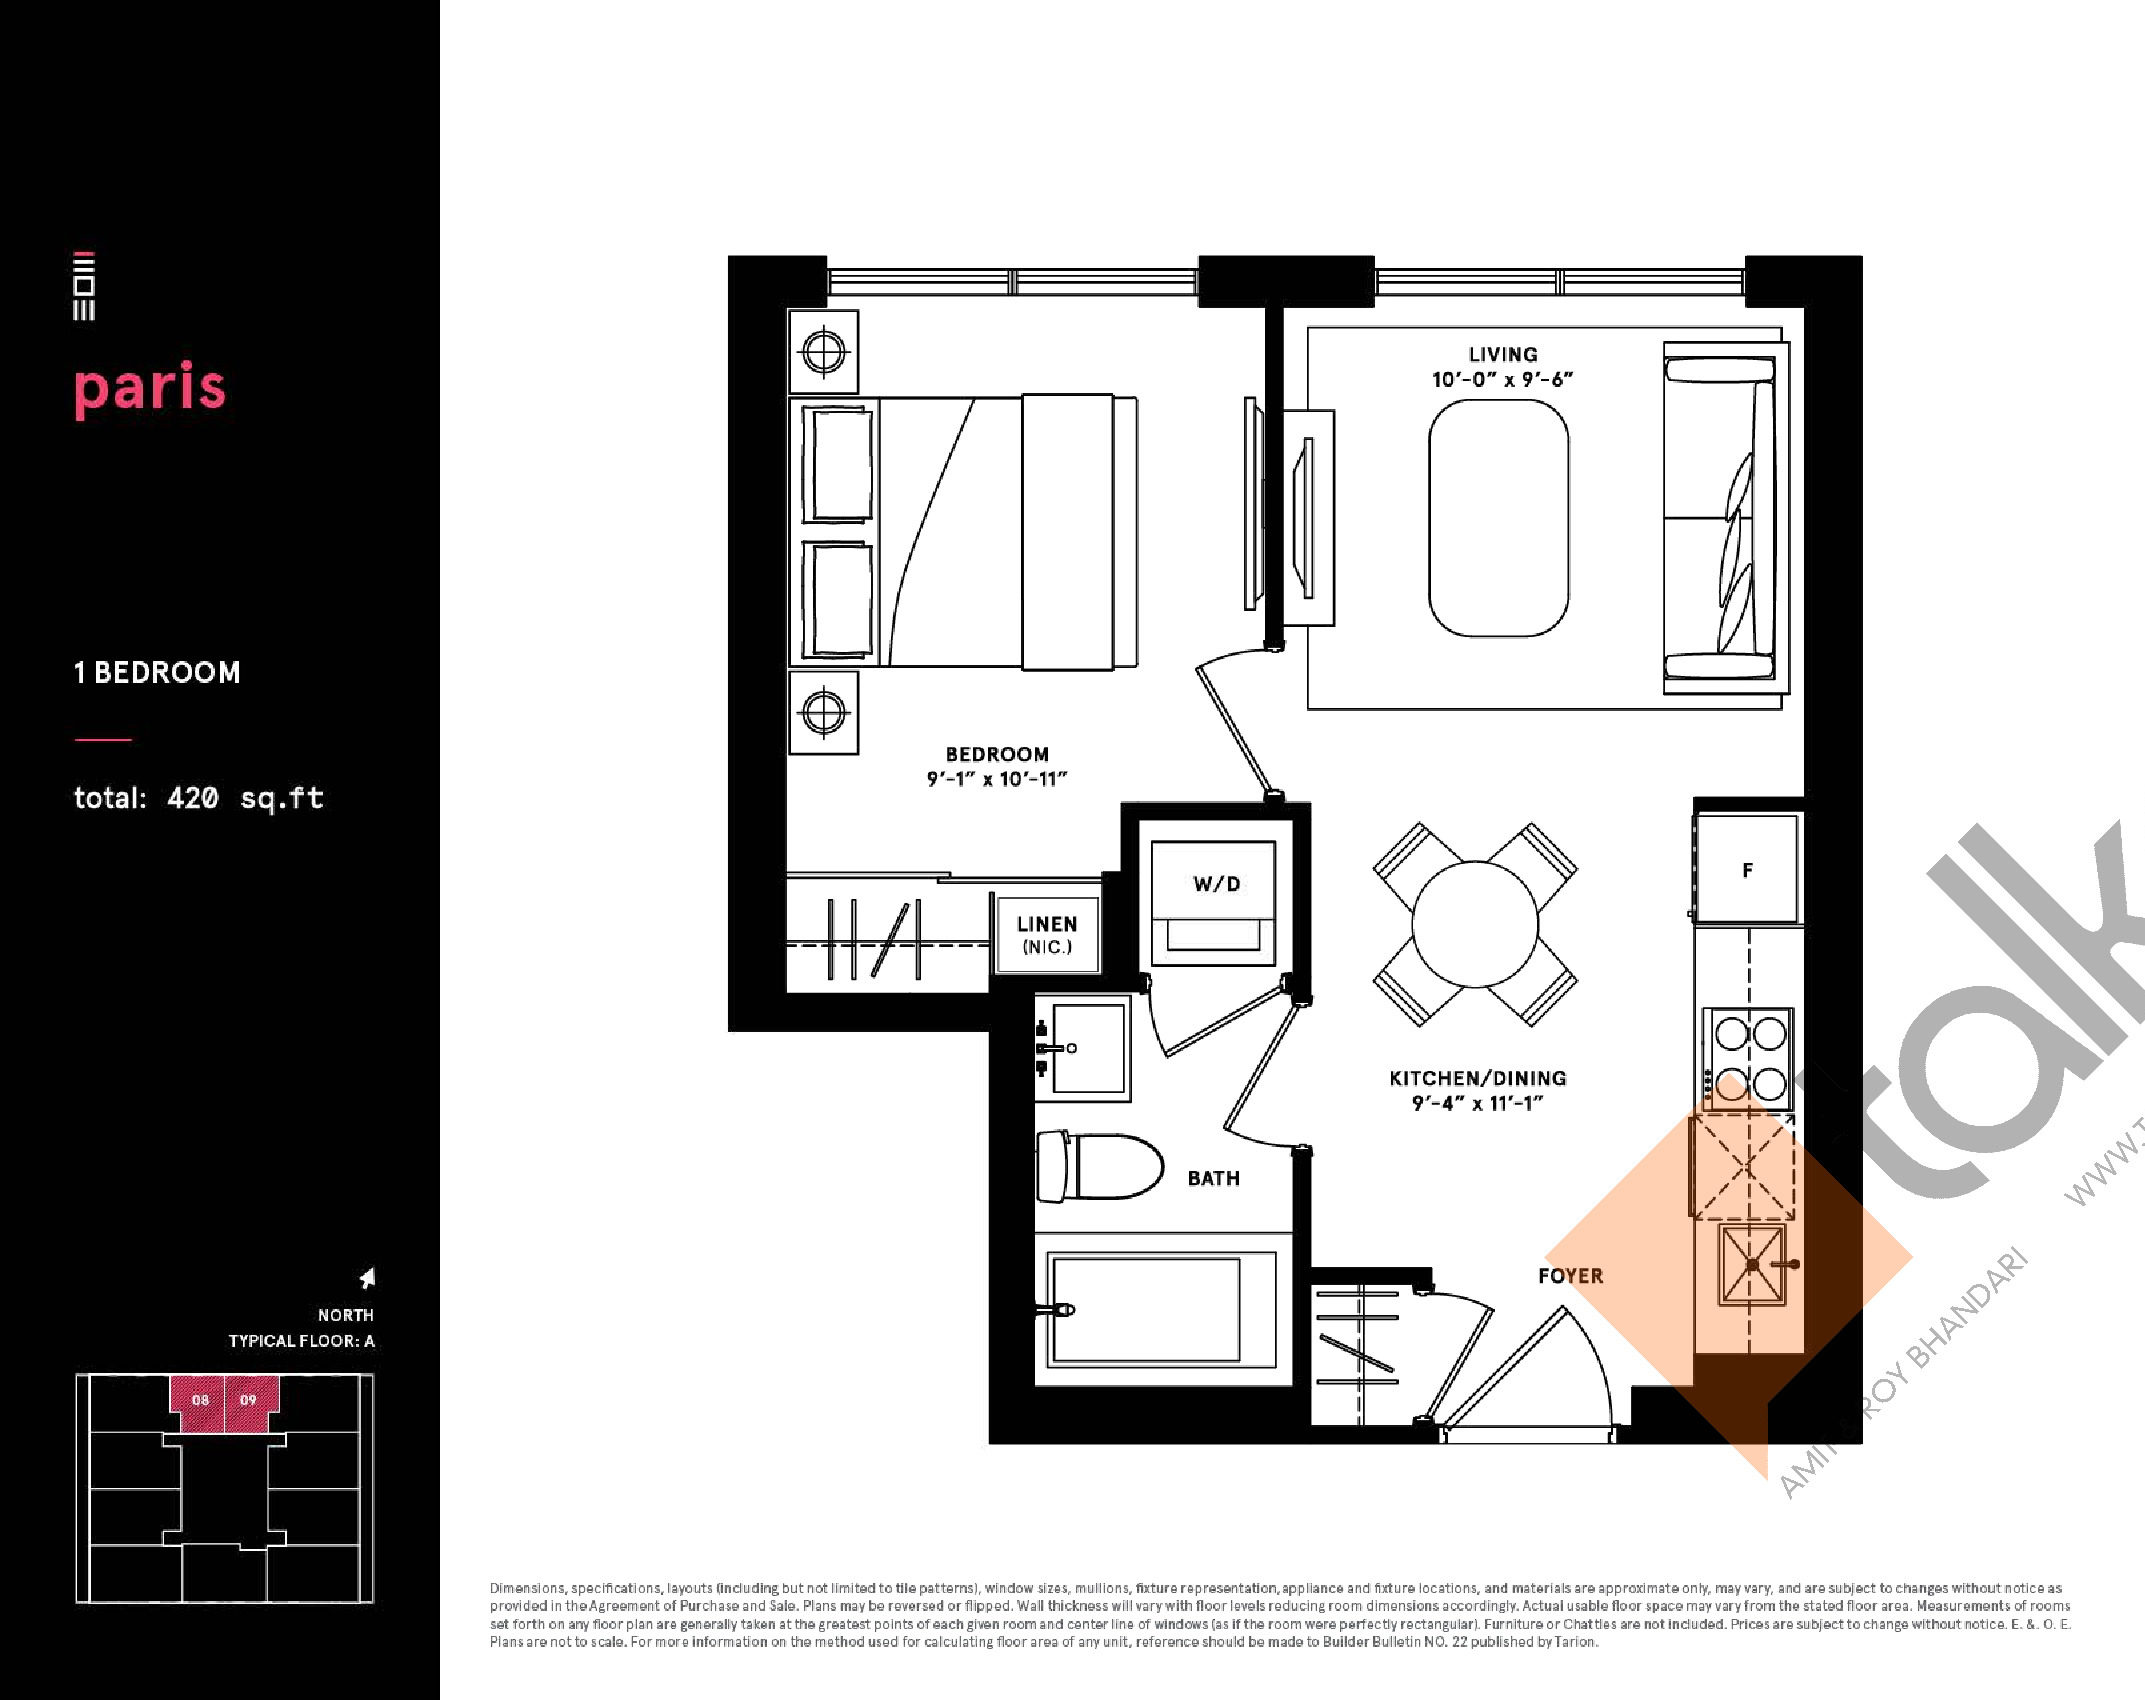 Paris Floor Plan at Exchange District Condos - 420 sq.ft